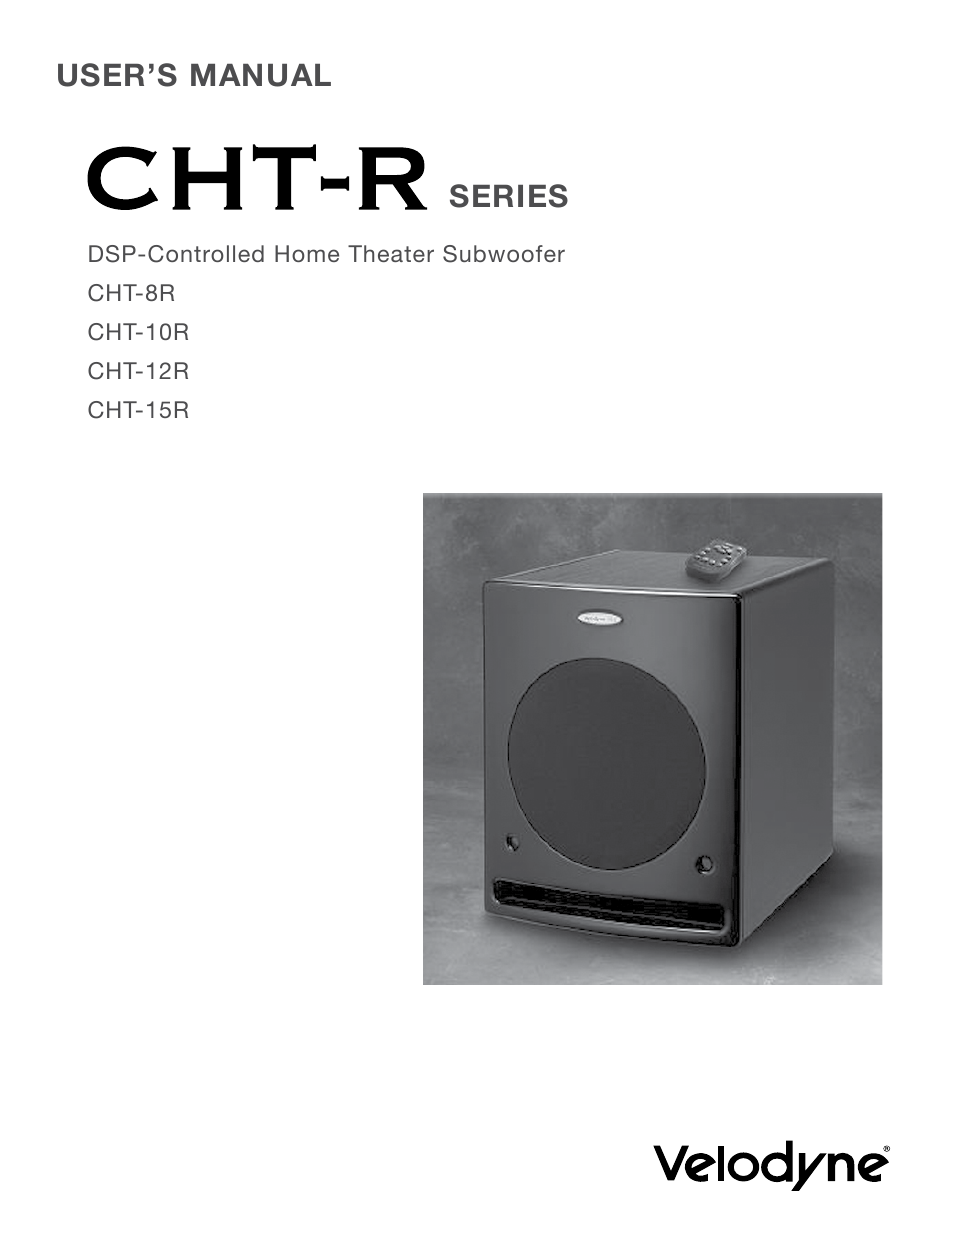 velodyne cht r series user manual 24 pages rh manualsdir com